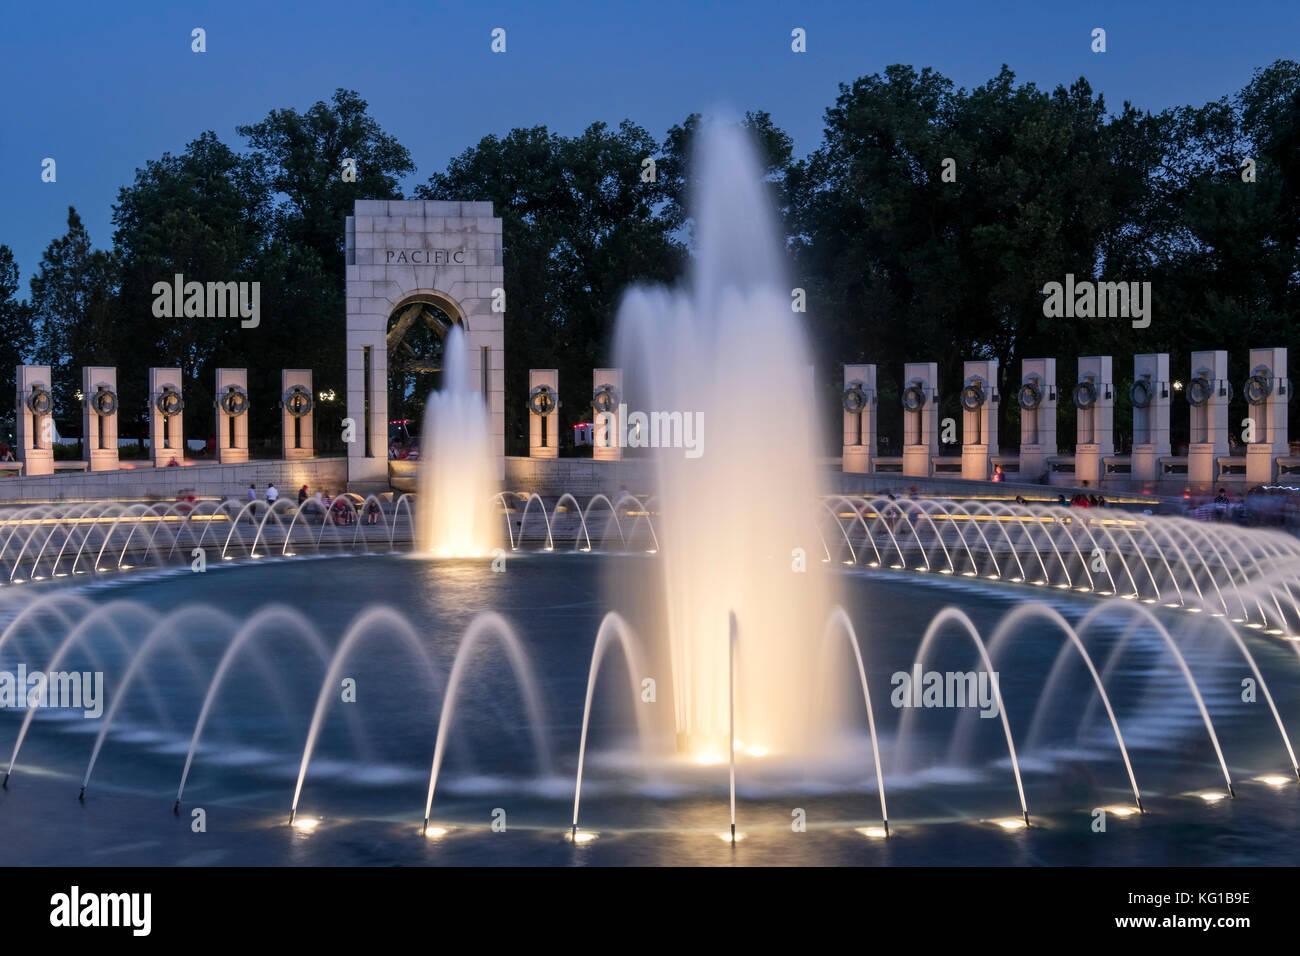 The World War 2 Memorial at night, National Mall, Washington DC, USA - Stock Image